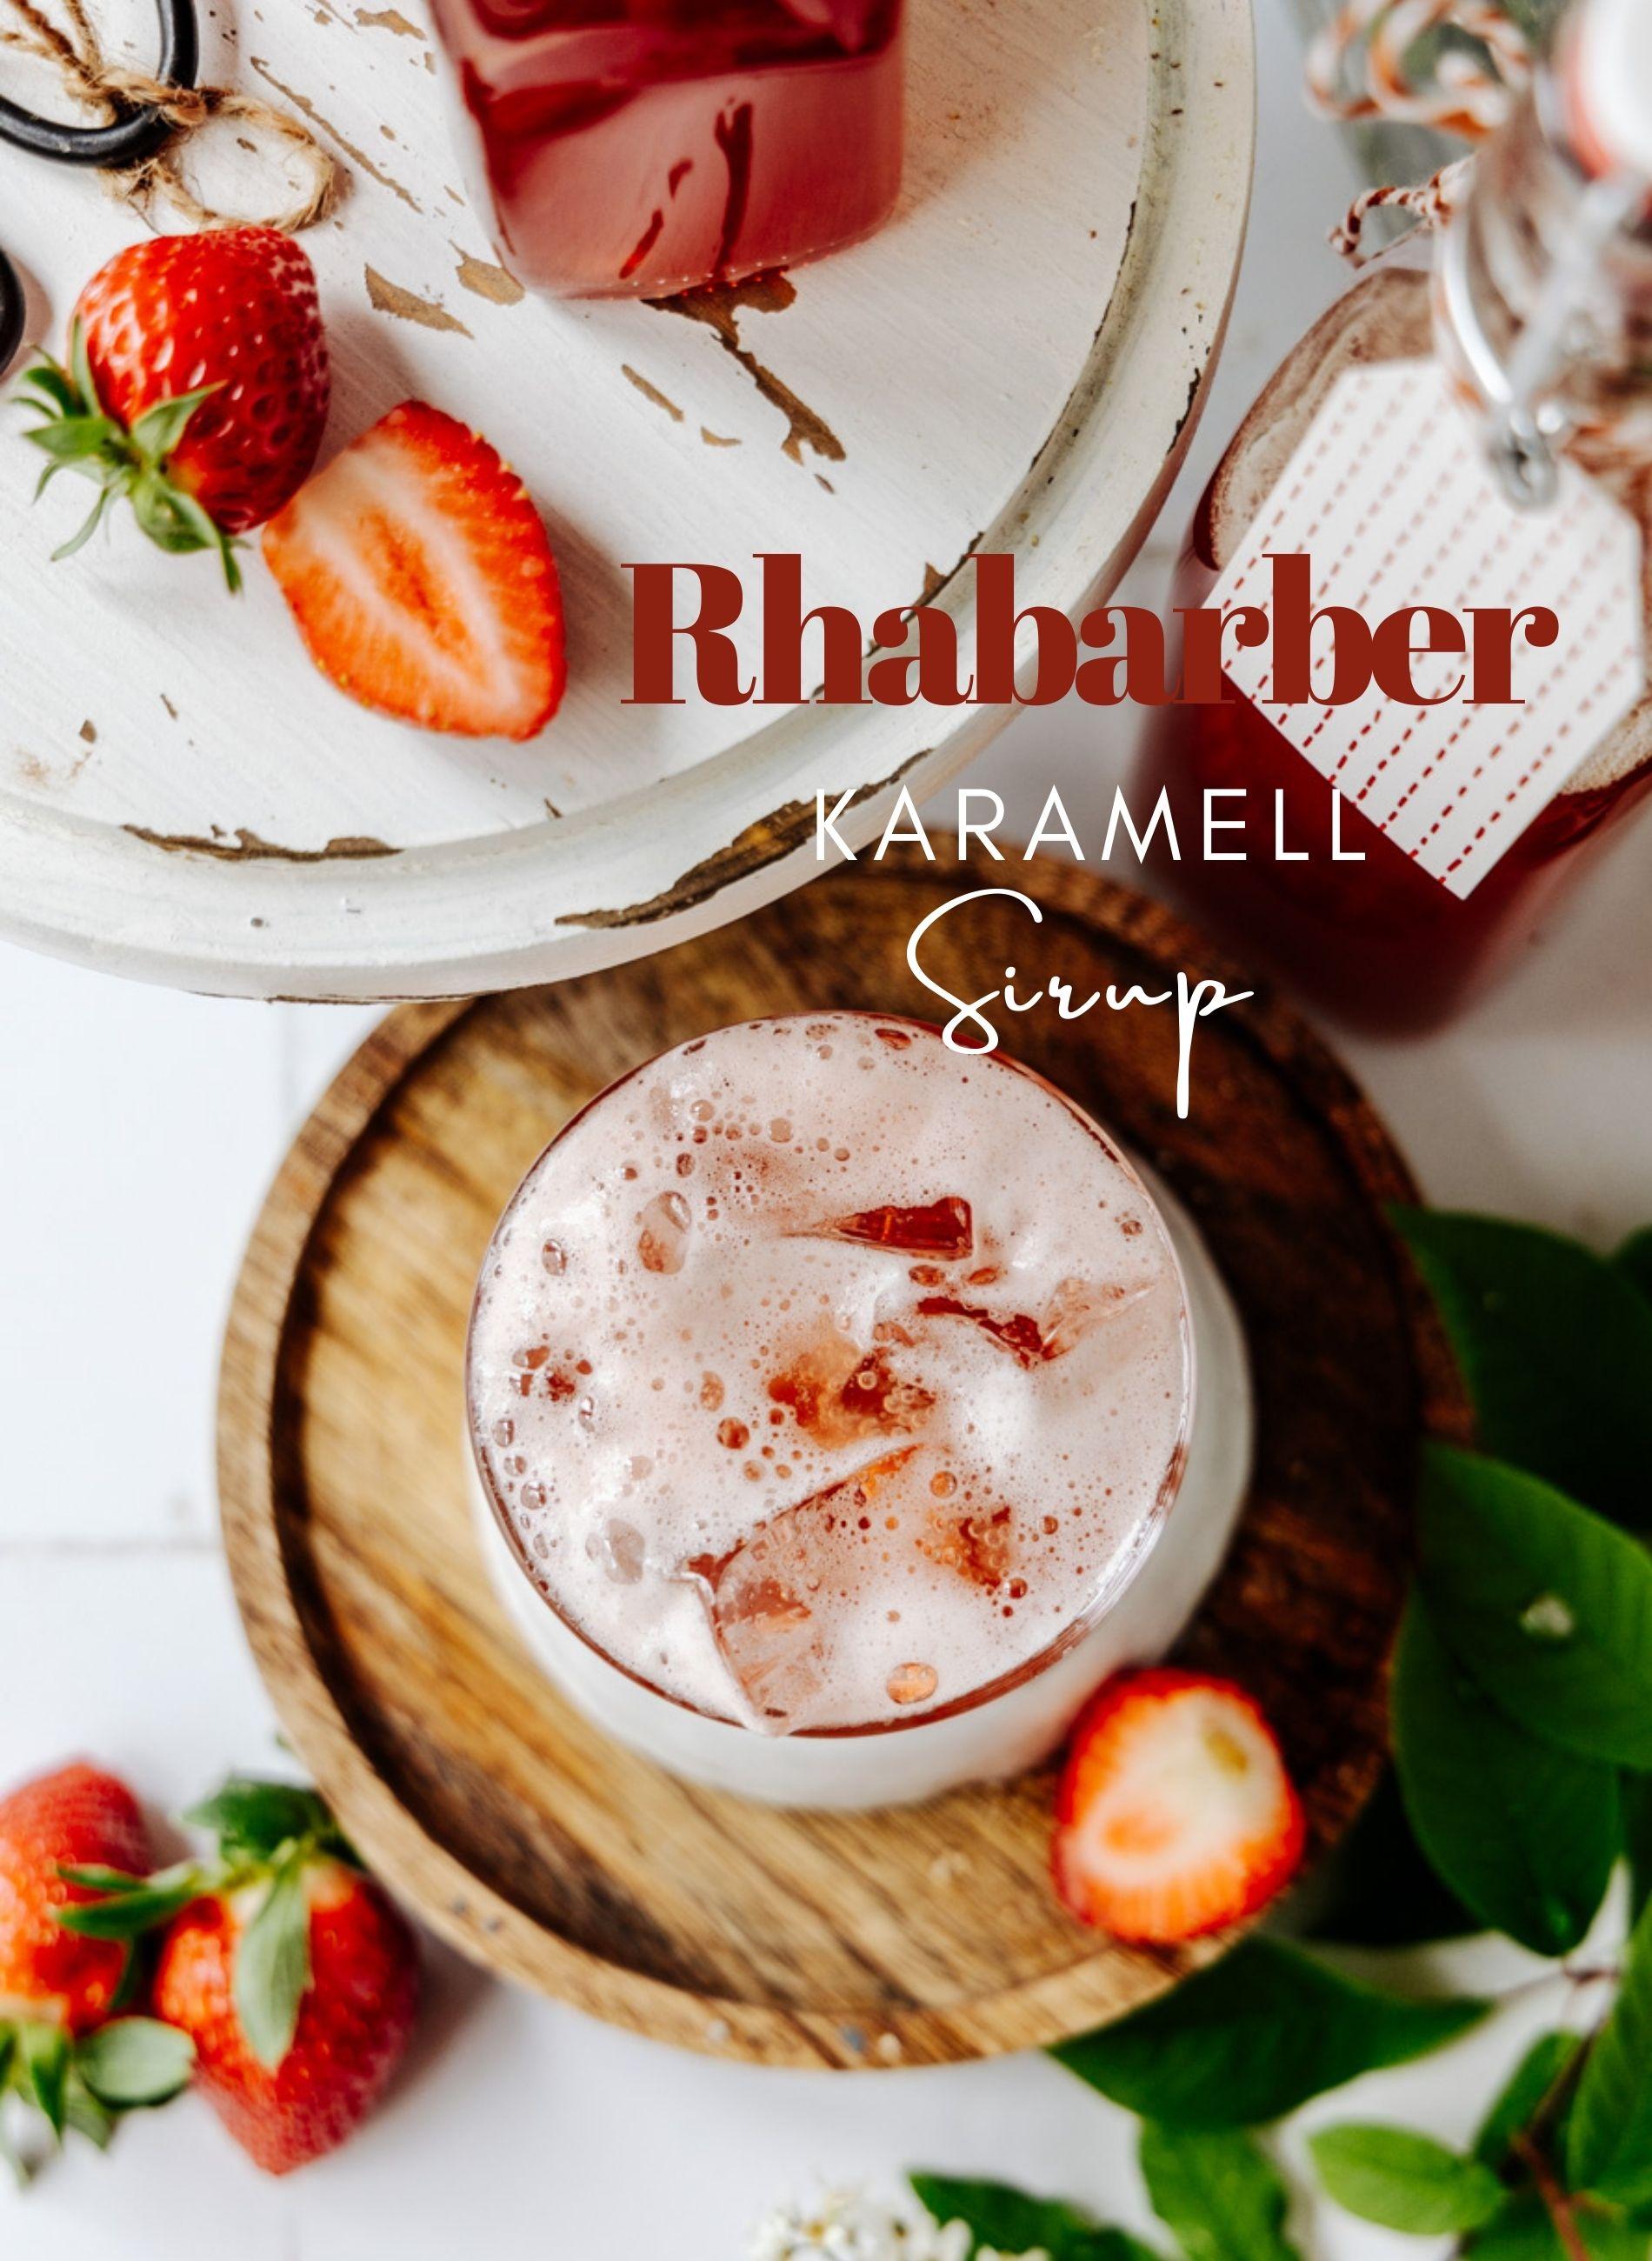 Rhabarber karamell sirup